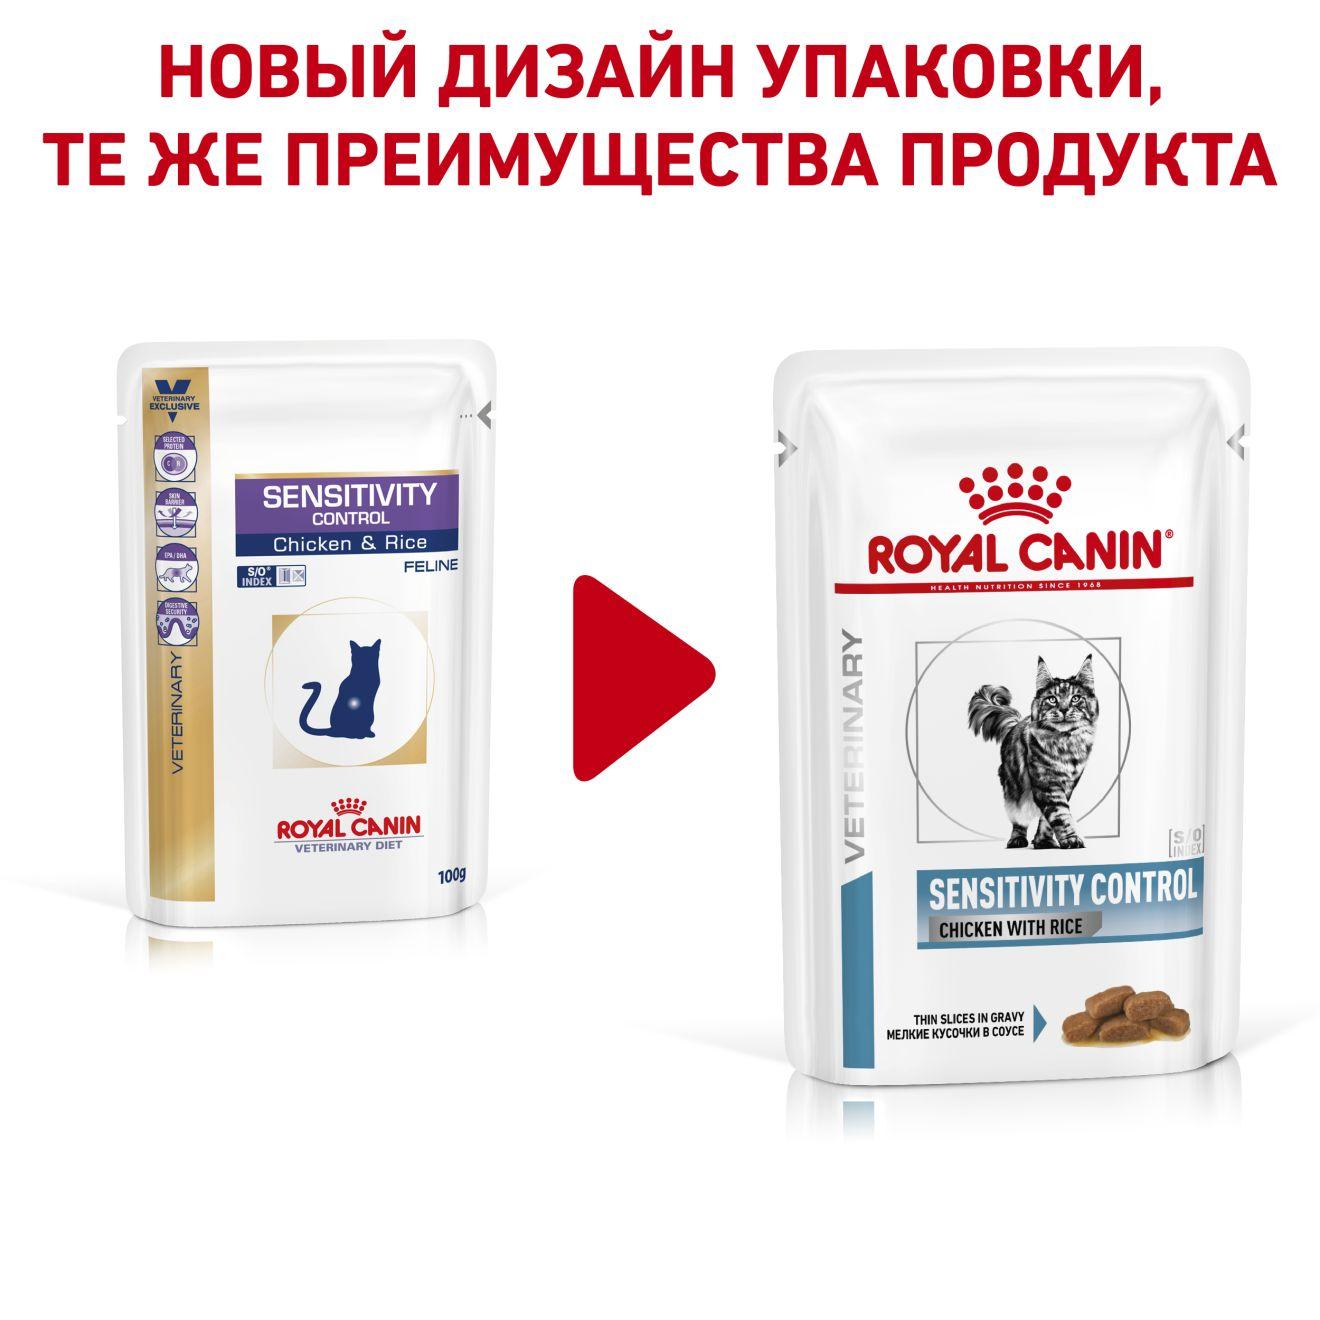 Sensitivity Control Chicken with Rice (в соусе)